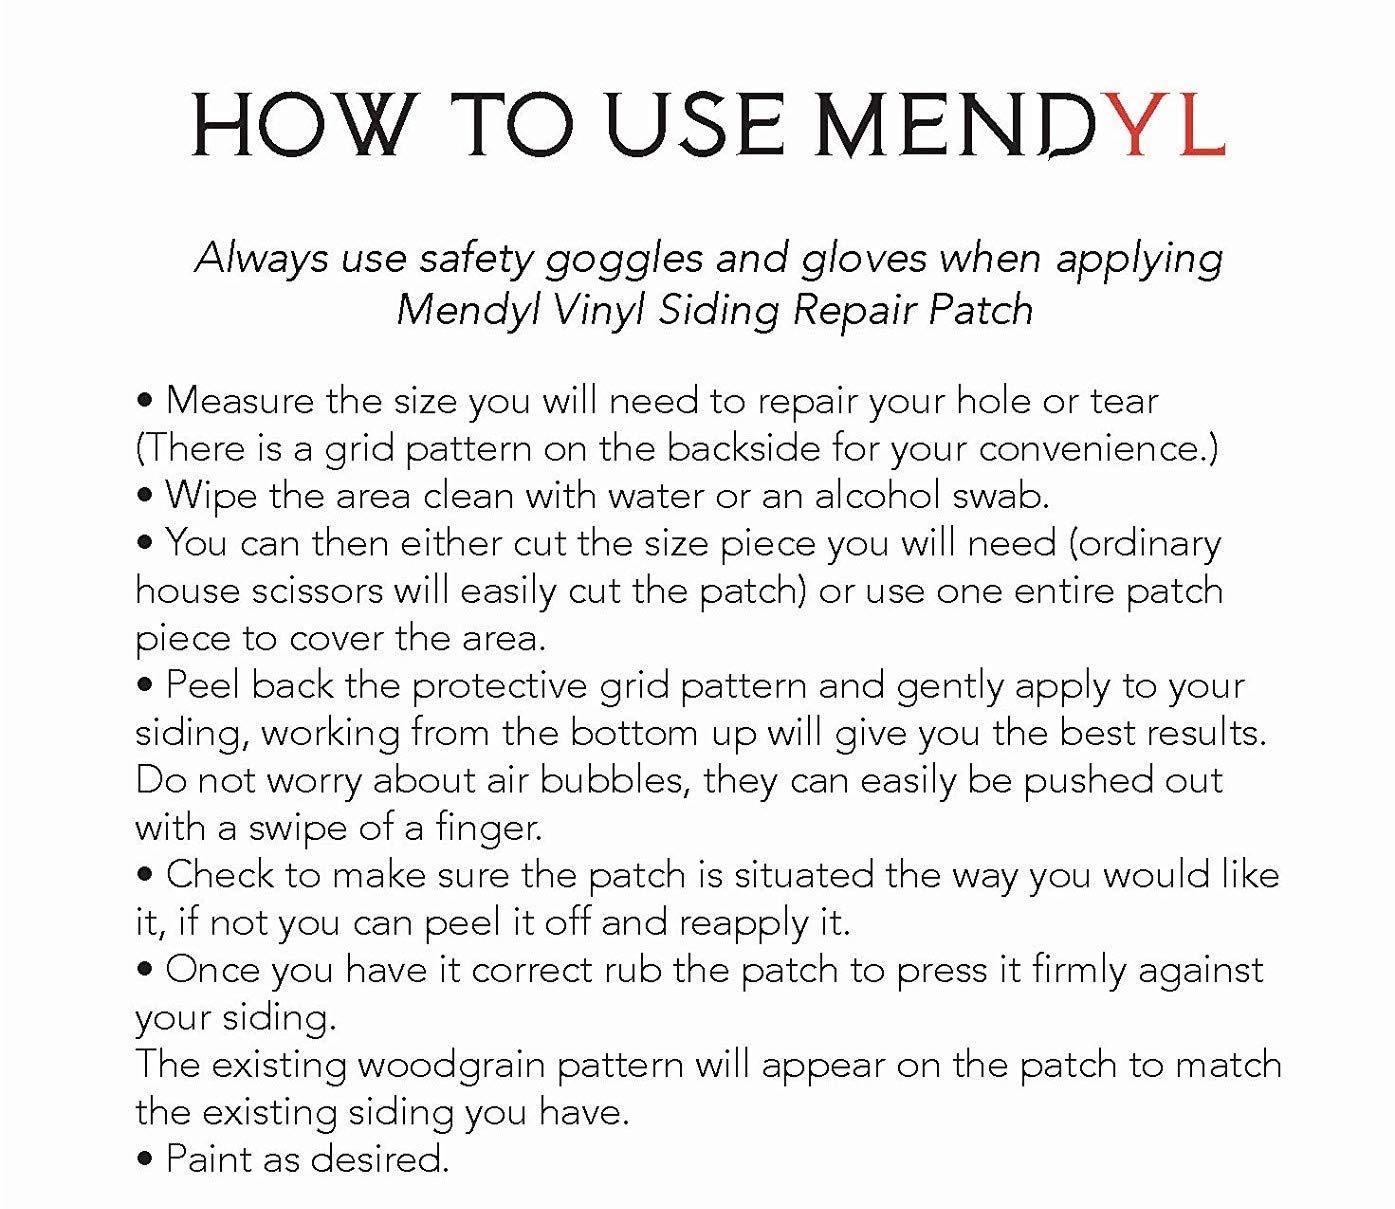 Mendyl Vinyl Siding Repair Kit, Cover Any Cracks, Holes, or Blemishes on Vinyl Siding - 10 Patches by Mendyl